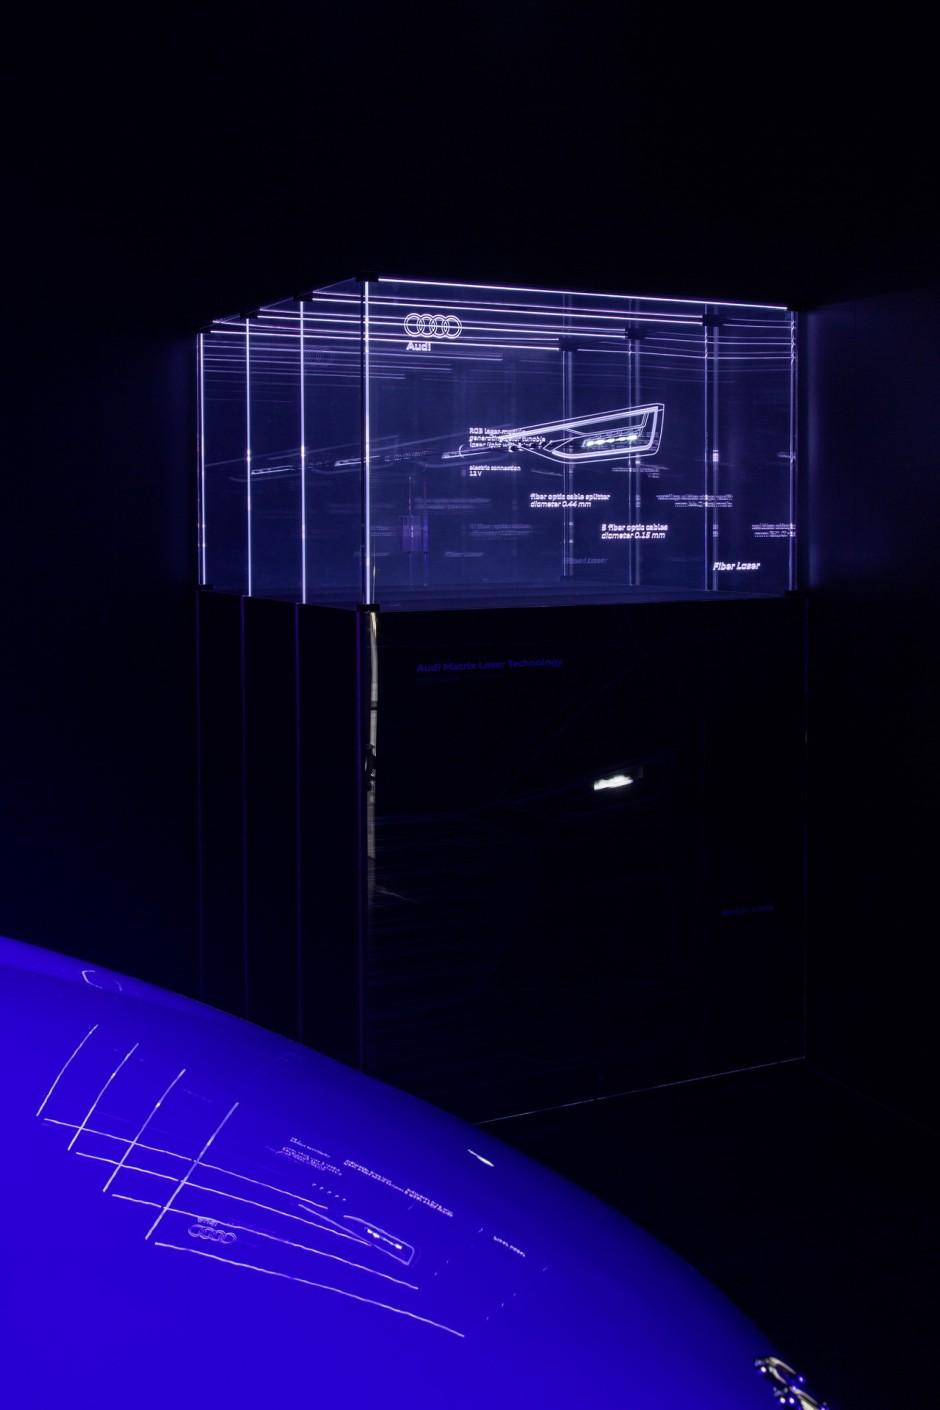 audi met en lumi re l 39 clairage laser matriciel photo 5 l 39 argus. Black Bedroom Furniture Sets. Home Design Ideas